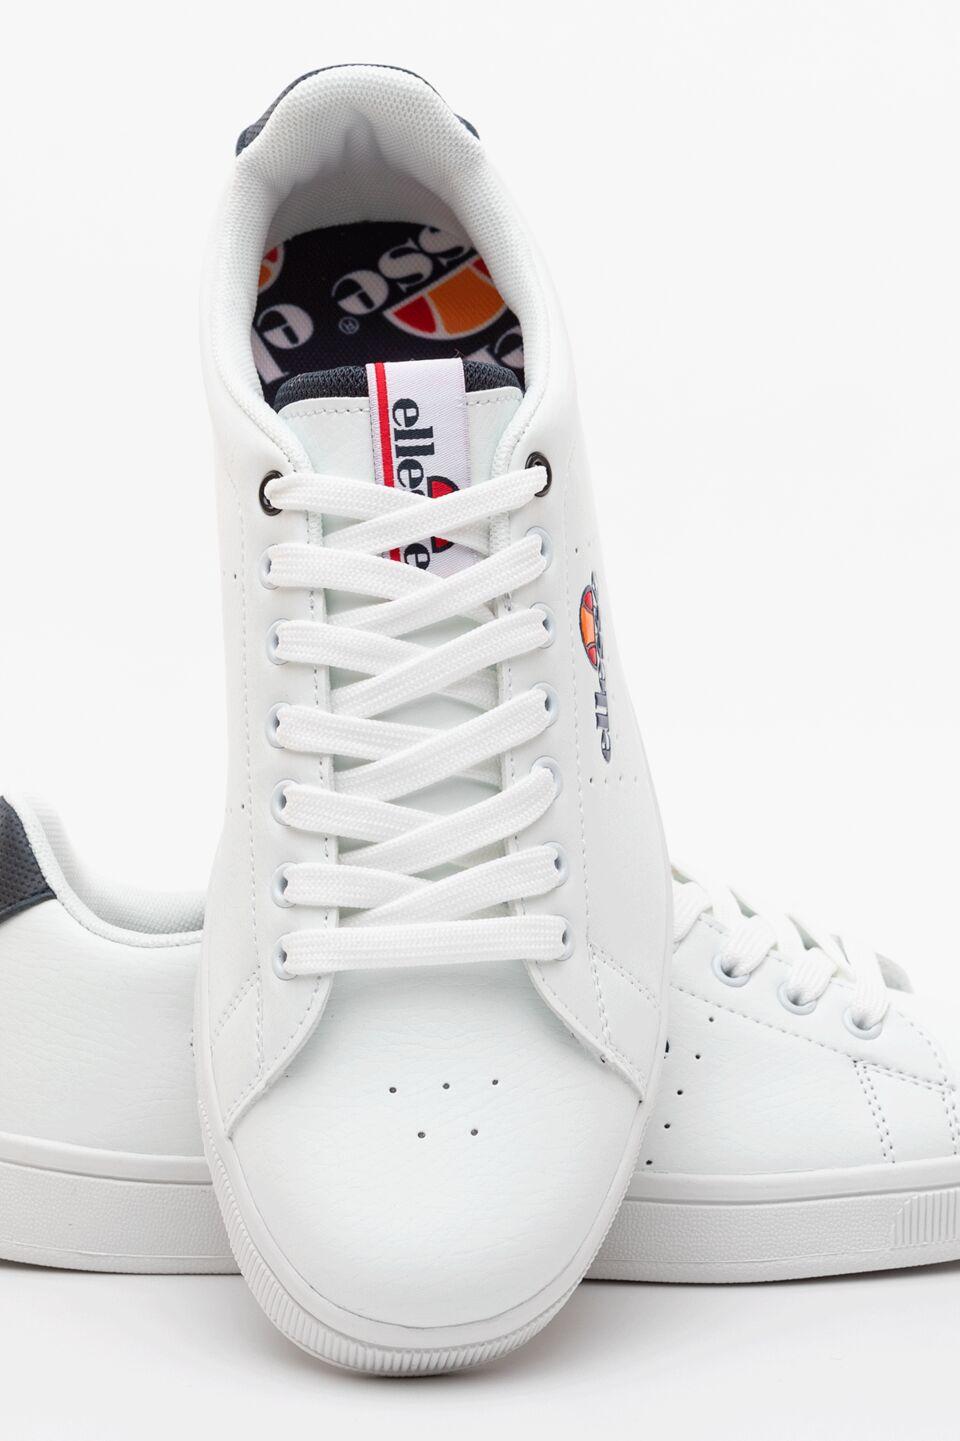 BENOIT 01 WHITE